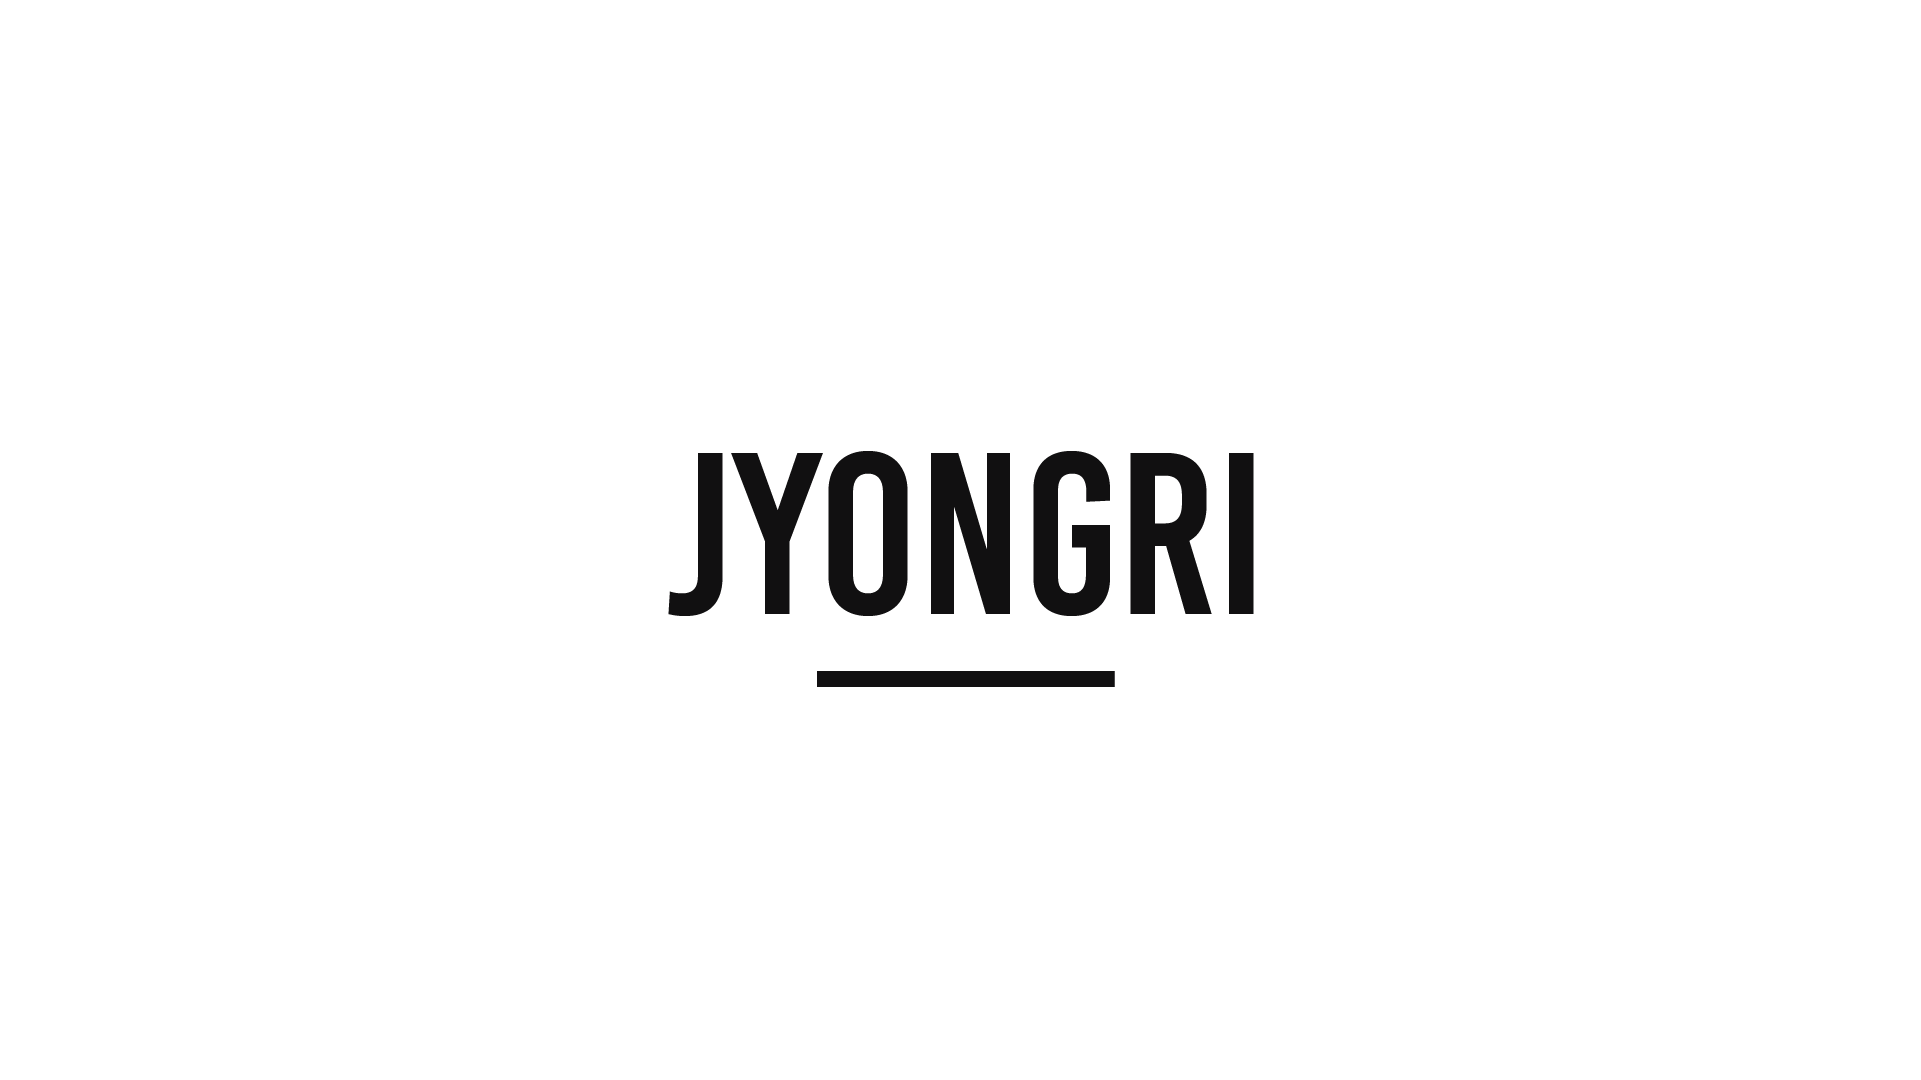 Jyongri